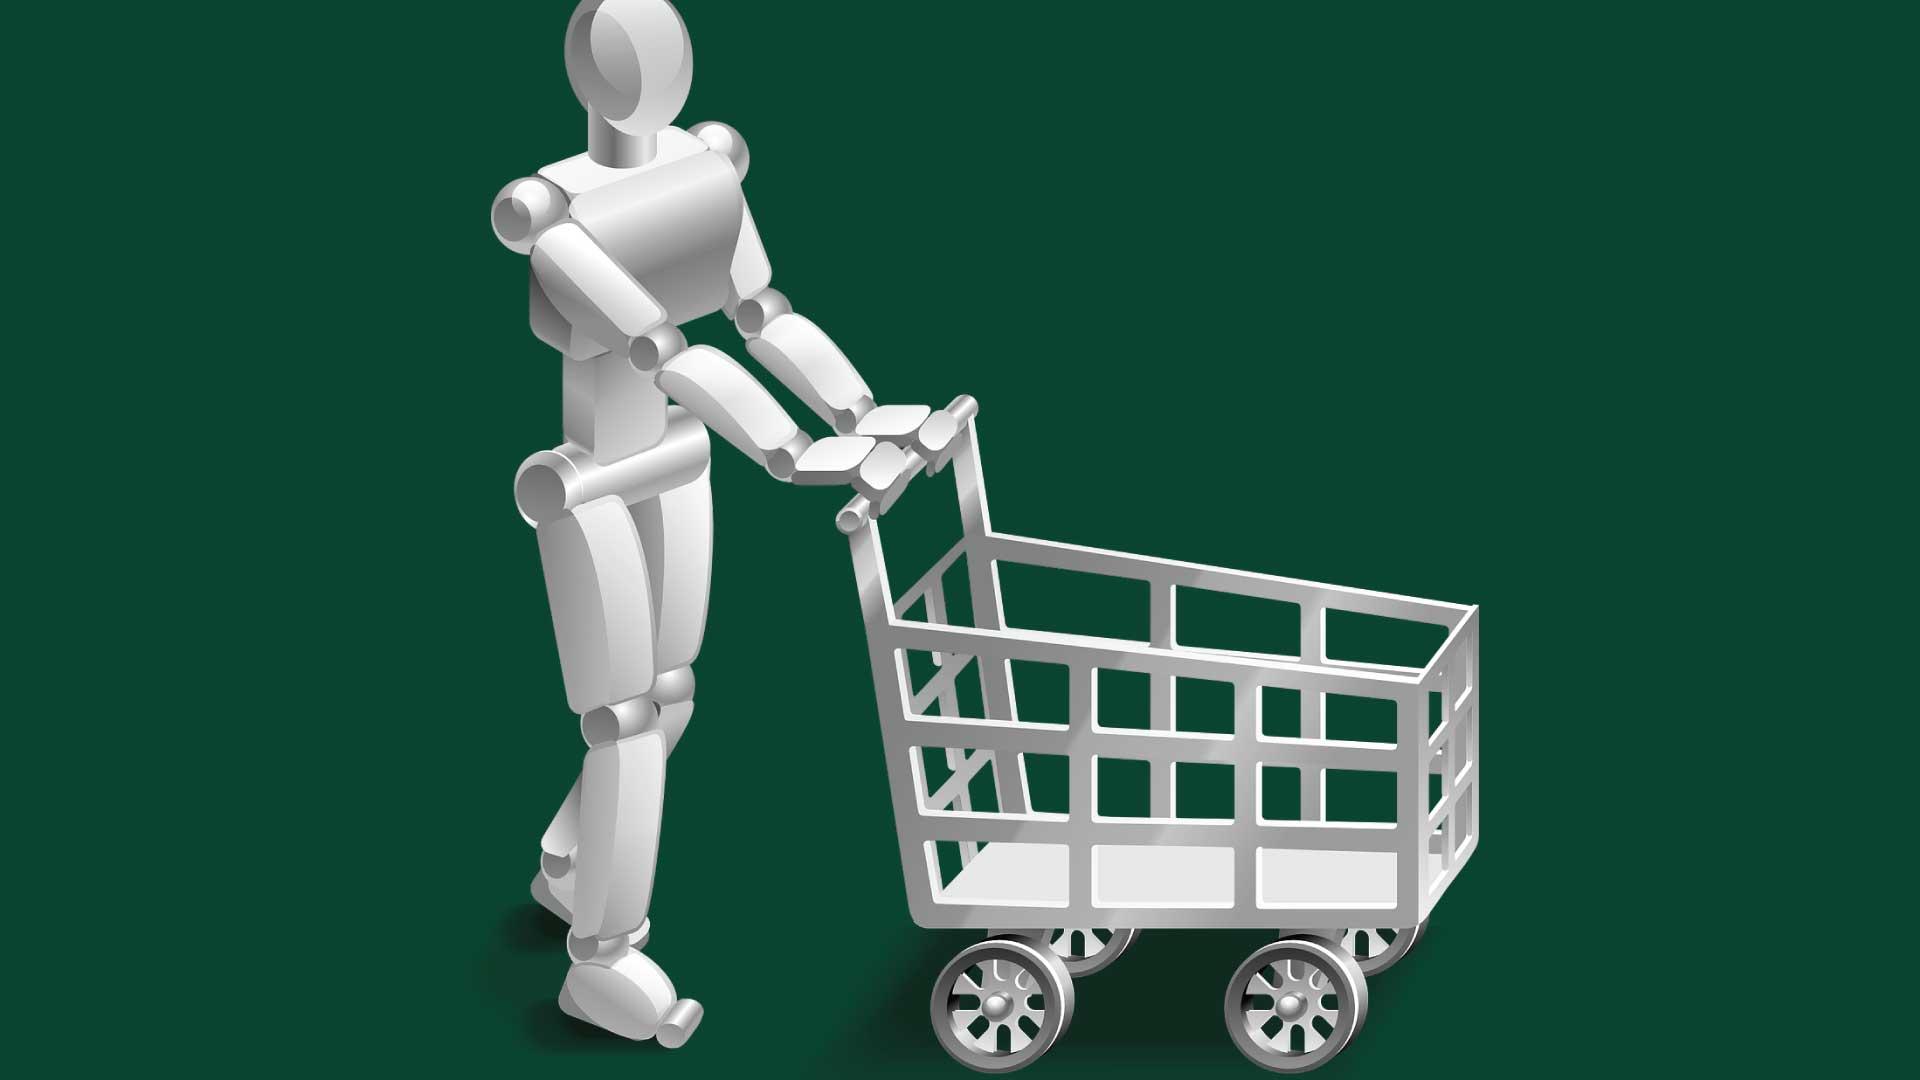 Joshua & Karsten Join Criteo to Drive Commerce Outcomes